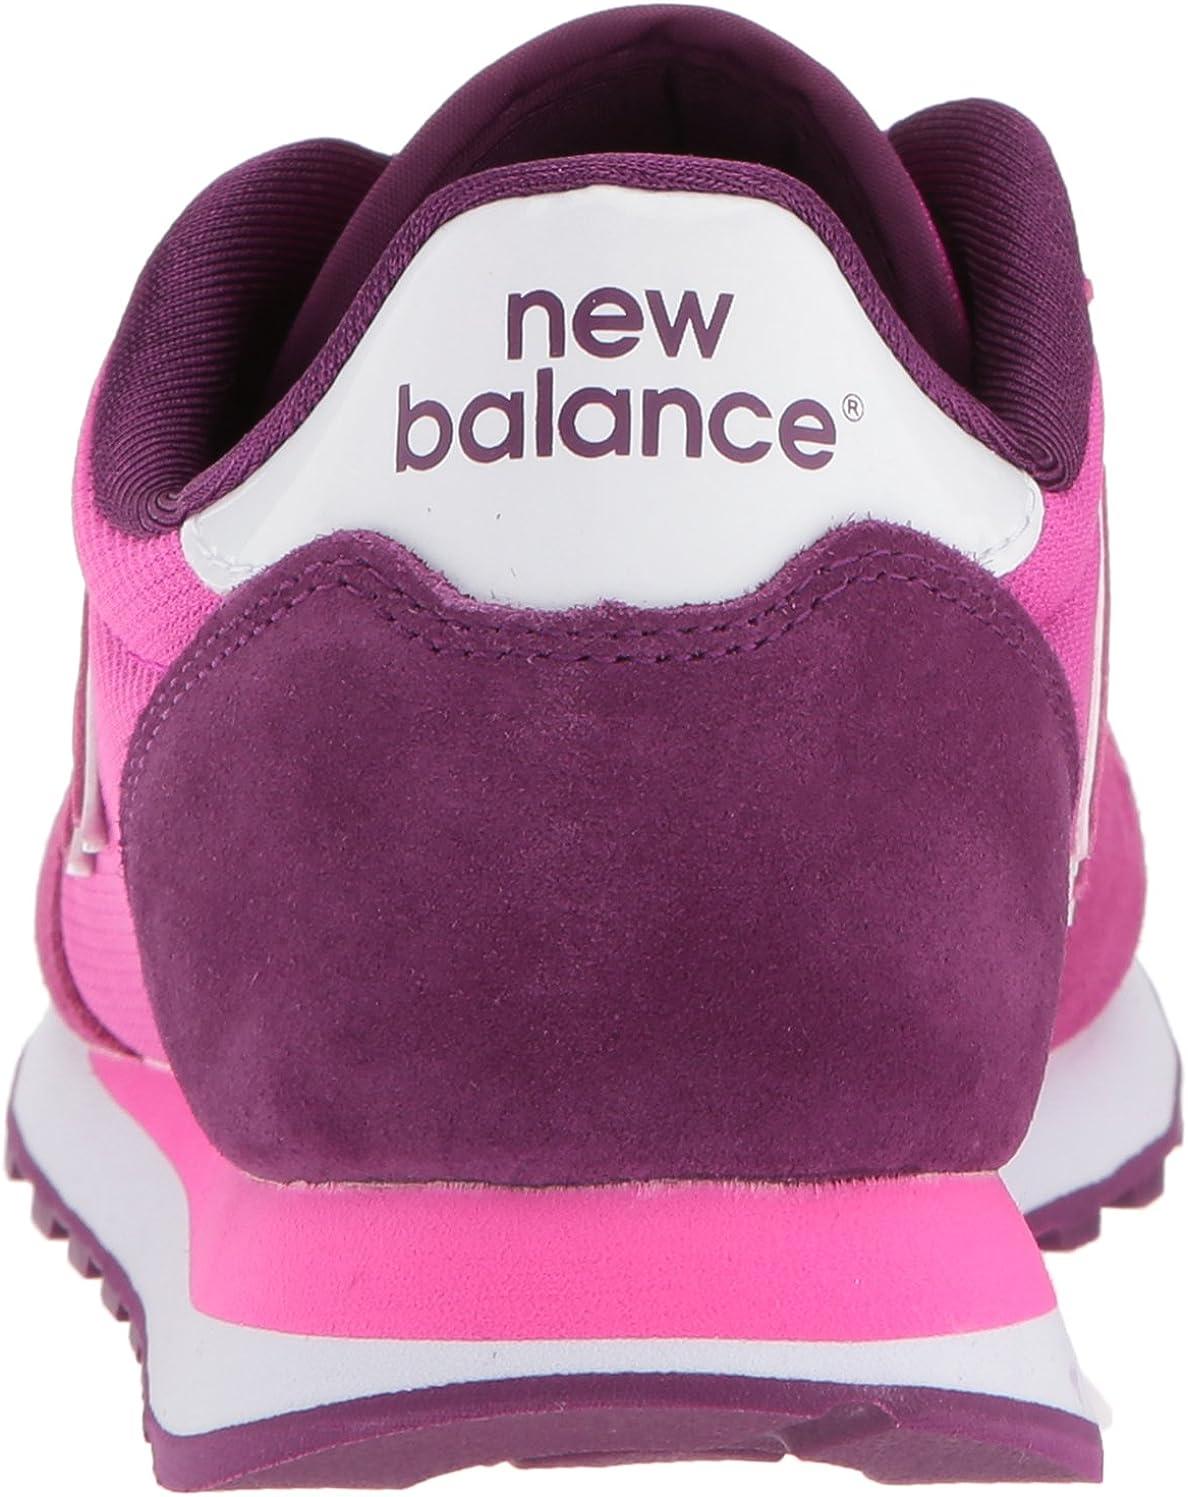 New Balance Women's 311v1 Lifestyle Shoe Sneaker